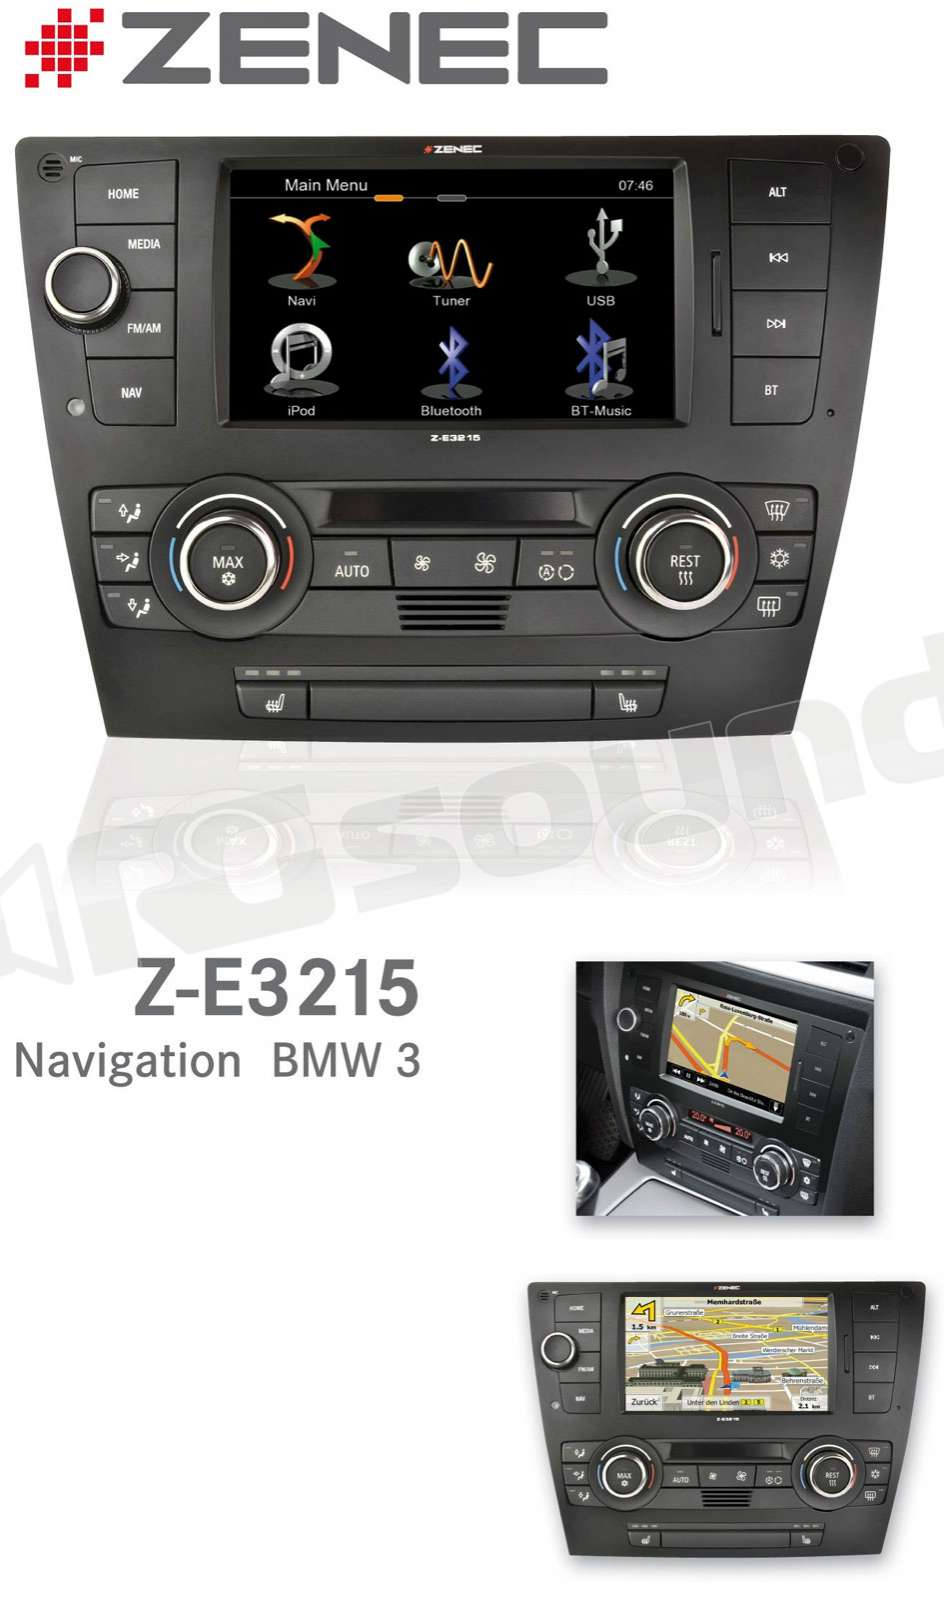 zenec z e3215 navigatore custom fit bmw serie 3 e90 e91. Black Bedroom Furniture Sets. Home Design Ideas